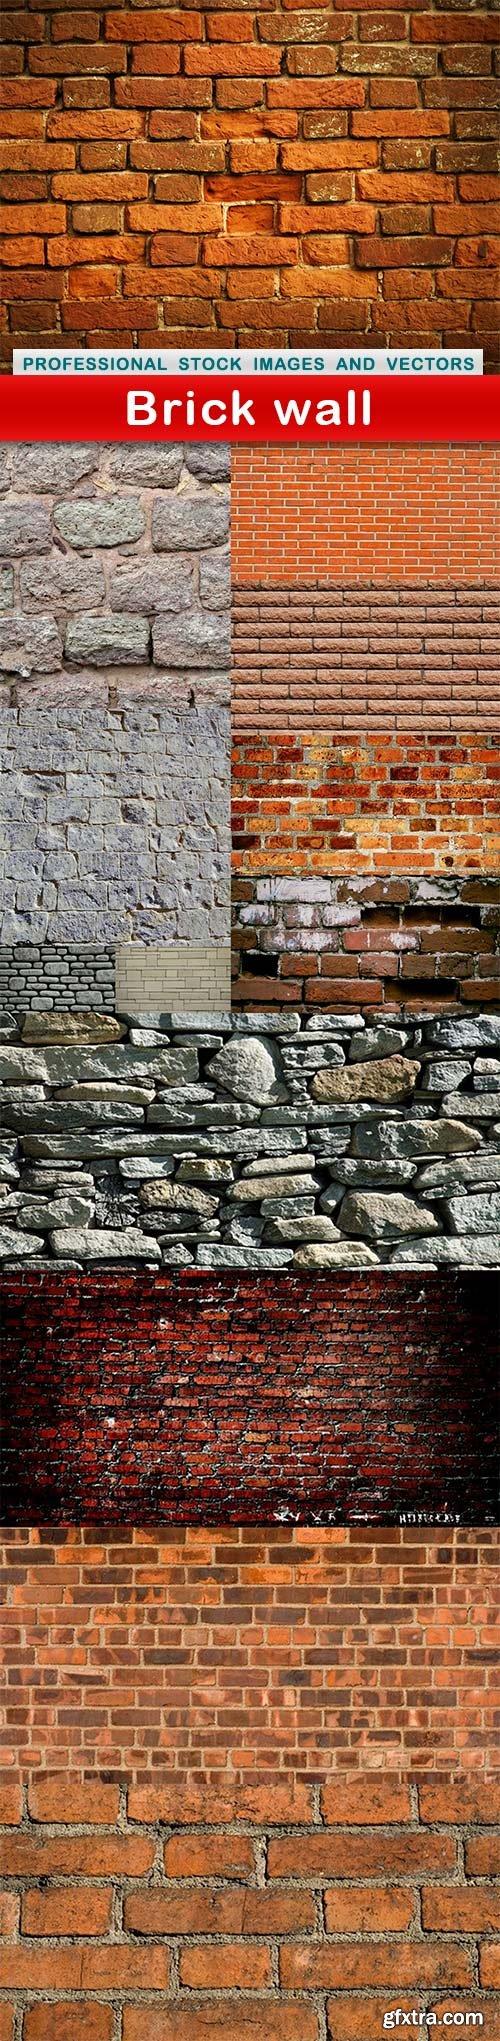 Brick wall - 13 UHQ JPEG